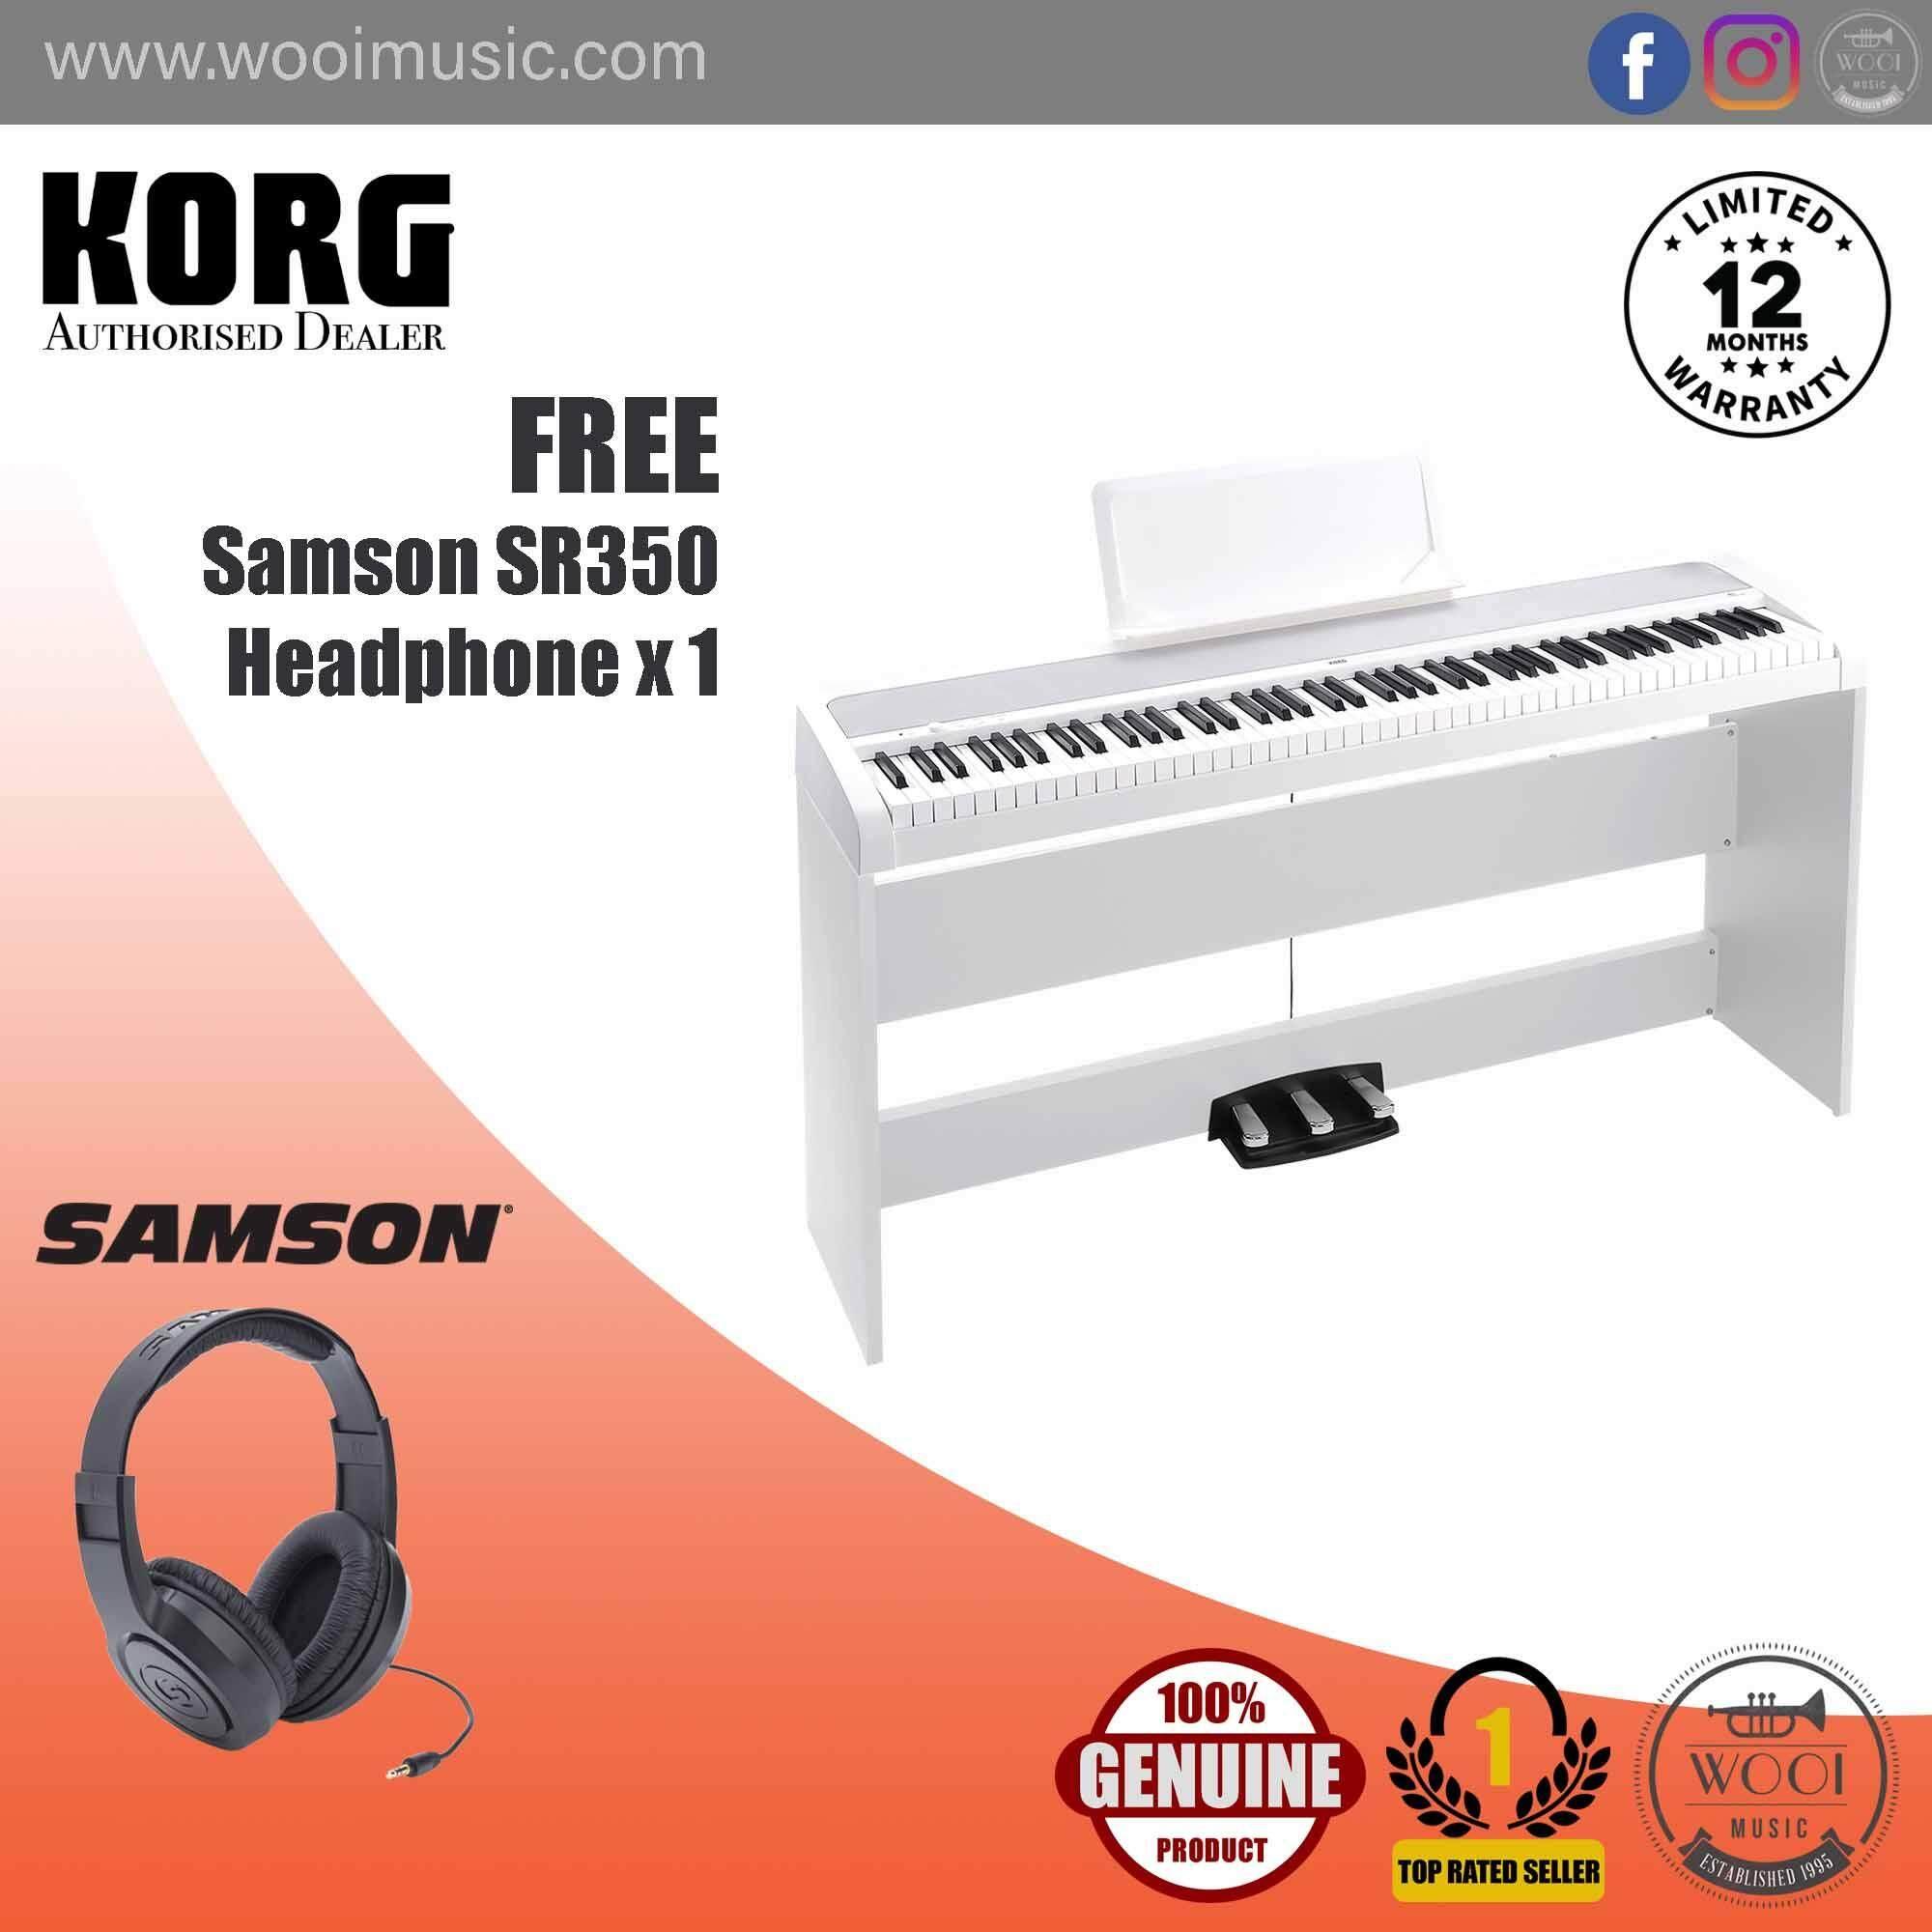 Korg B1SP-WH Digital Piano White (88Key) with Stand & 3 Pedal Unit (FREE Samson SR350 Headphone)